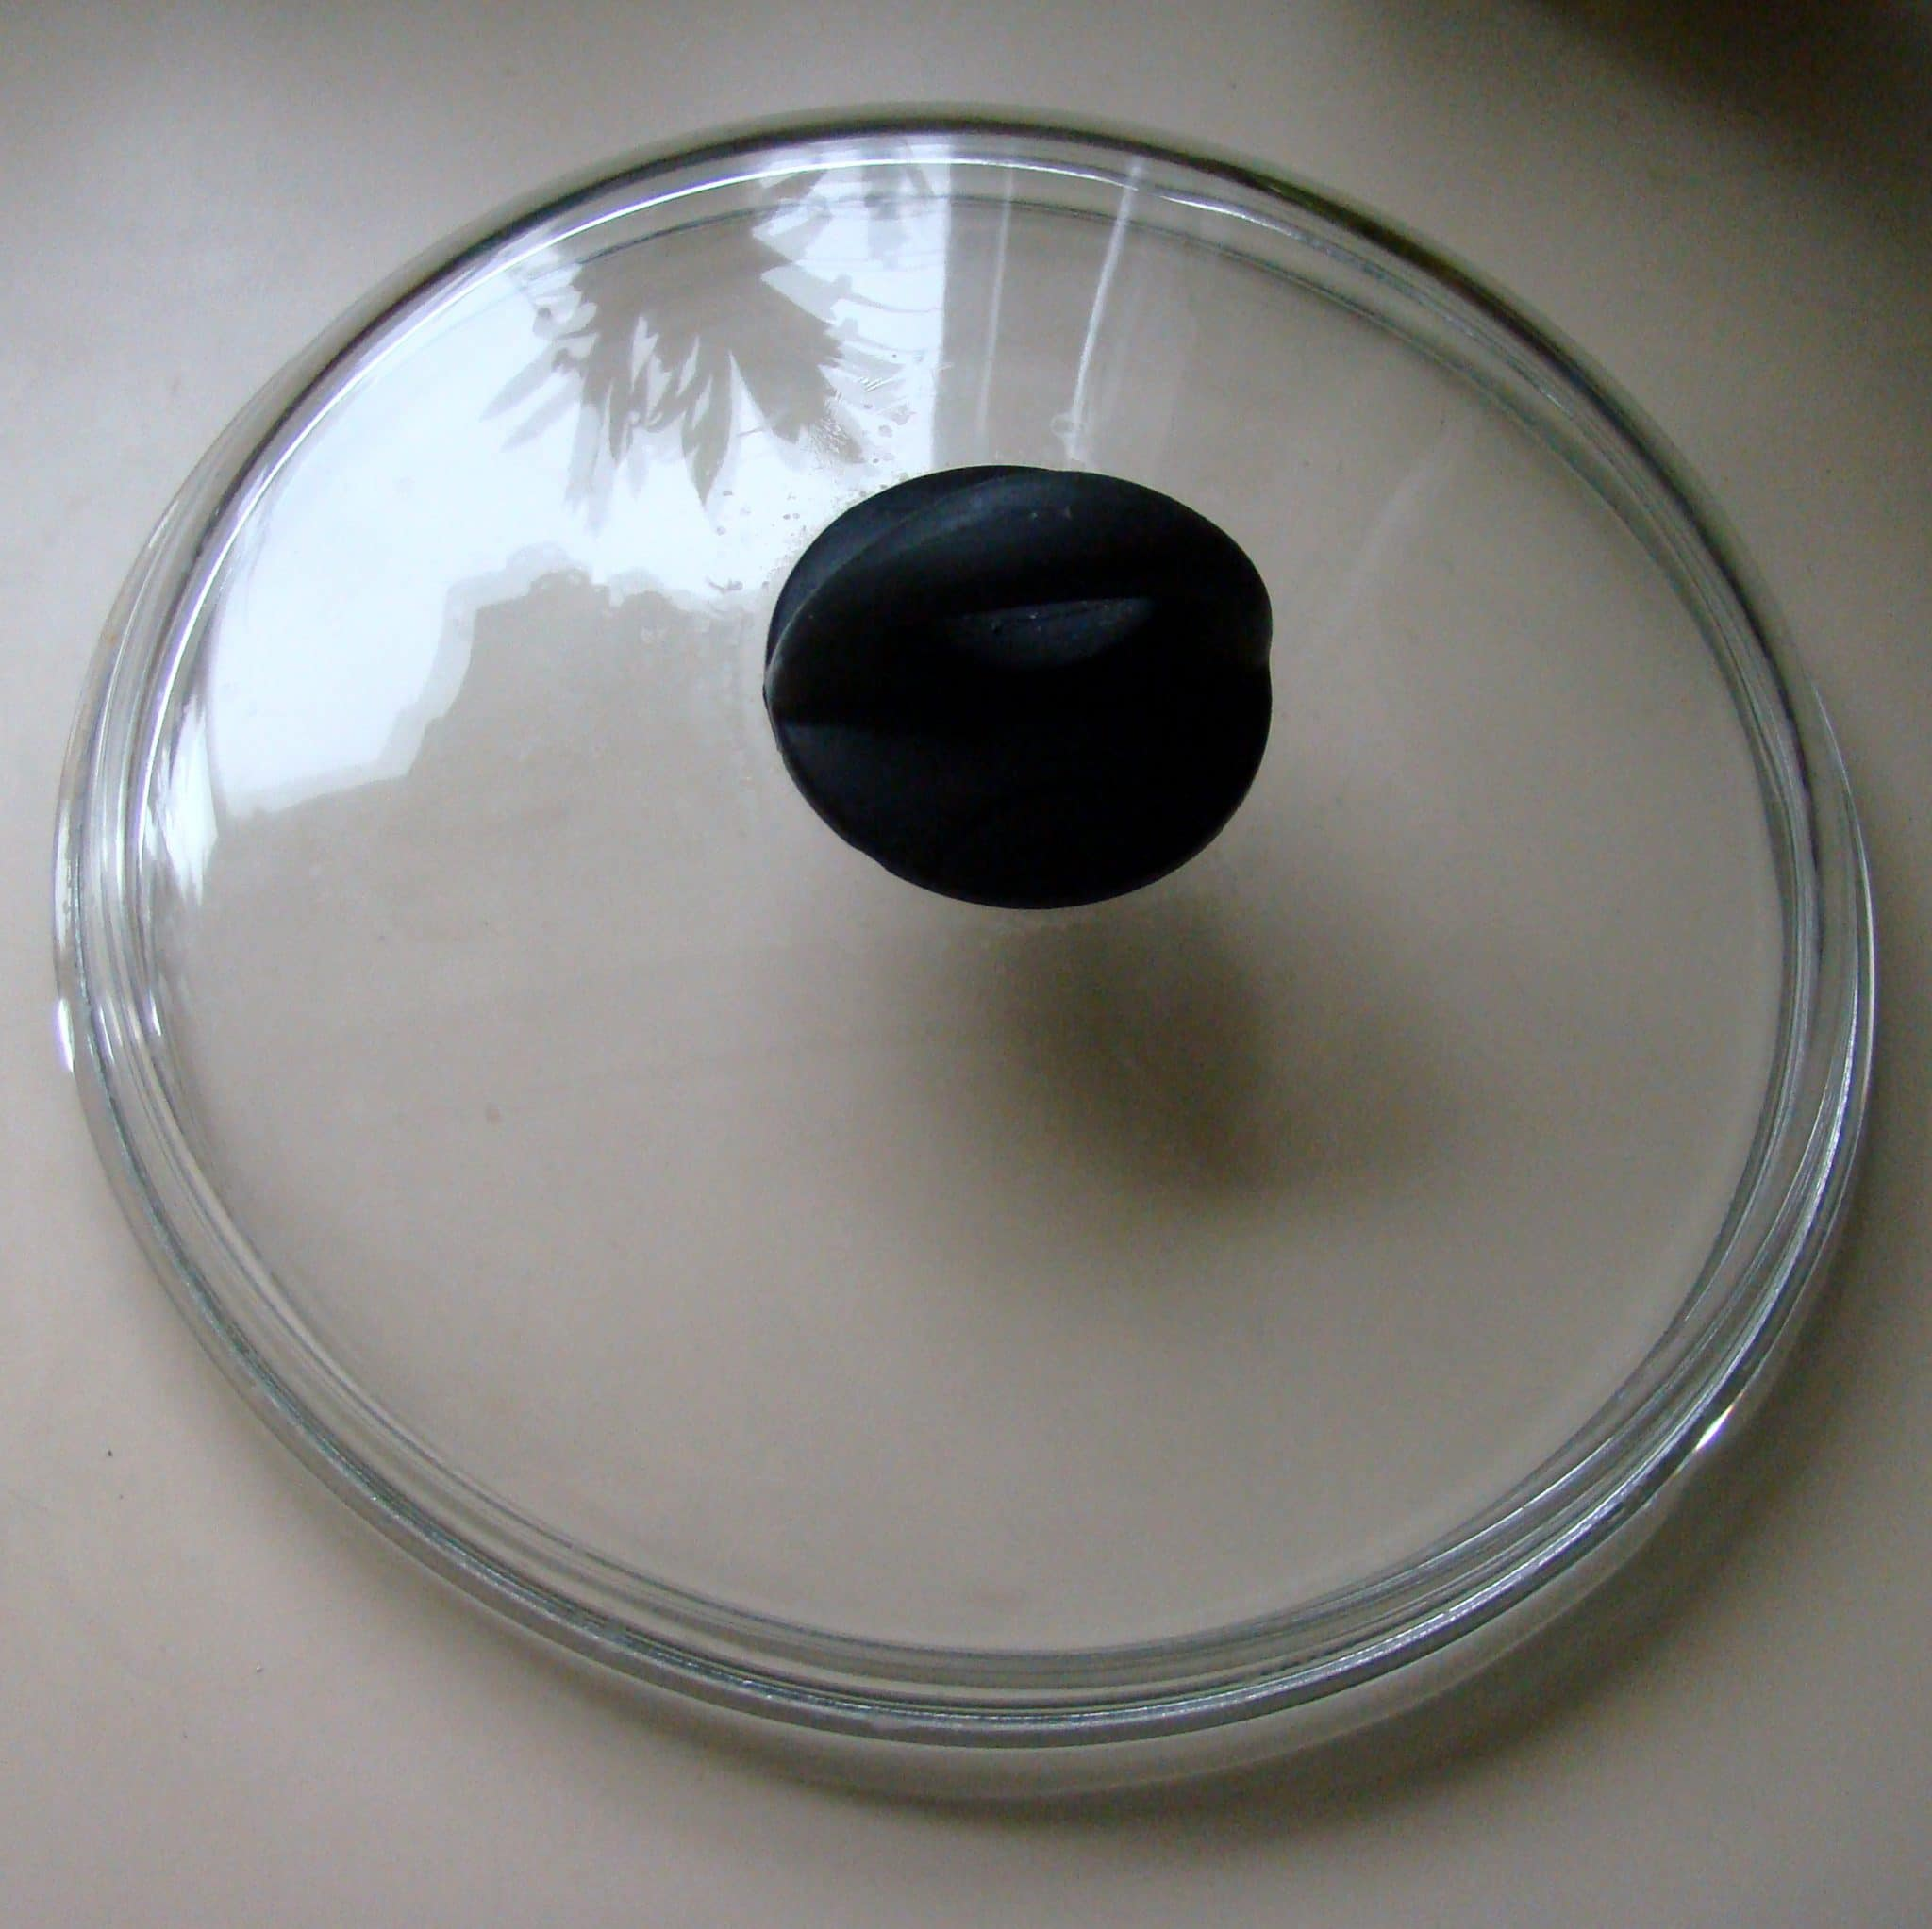 examples of kitchenware, ceramic kitchenware